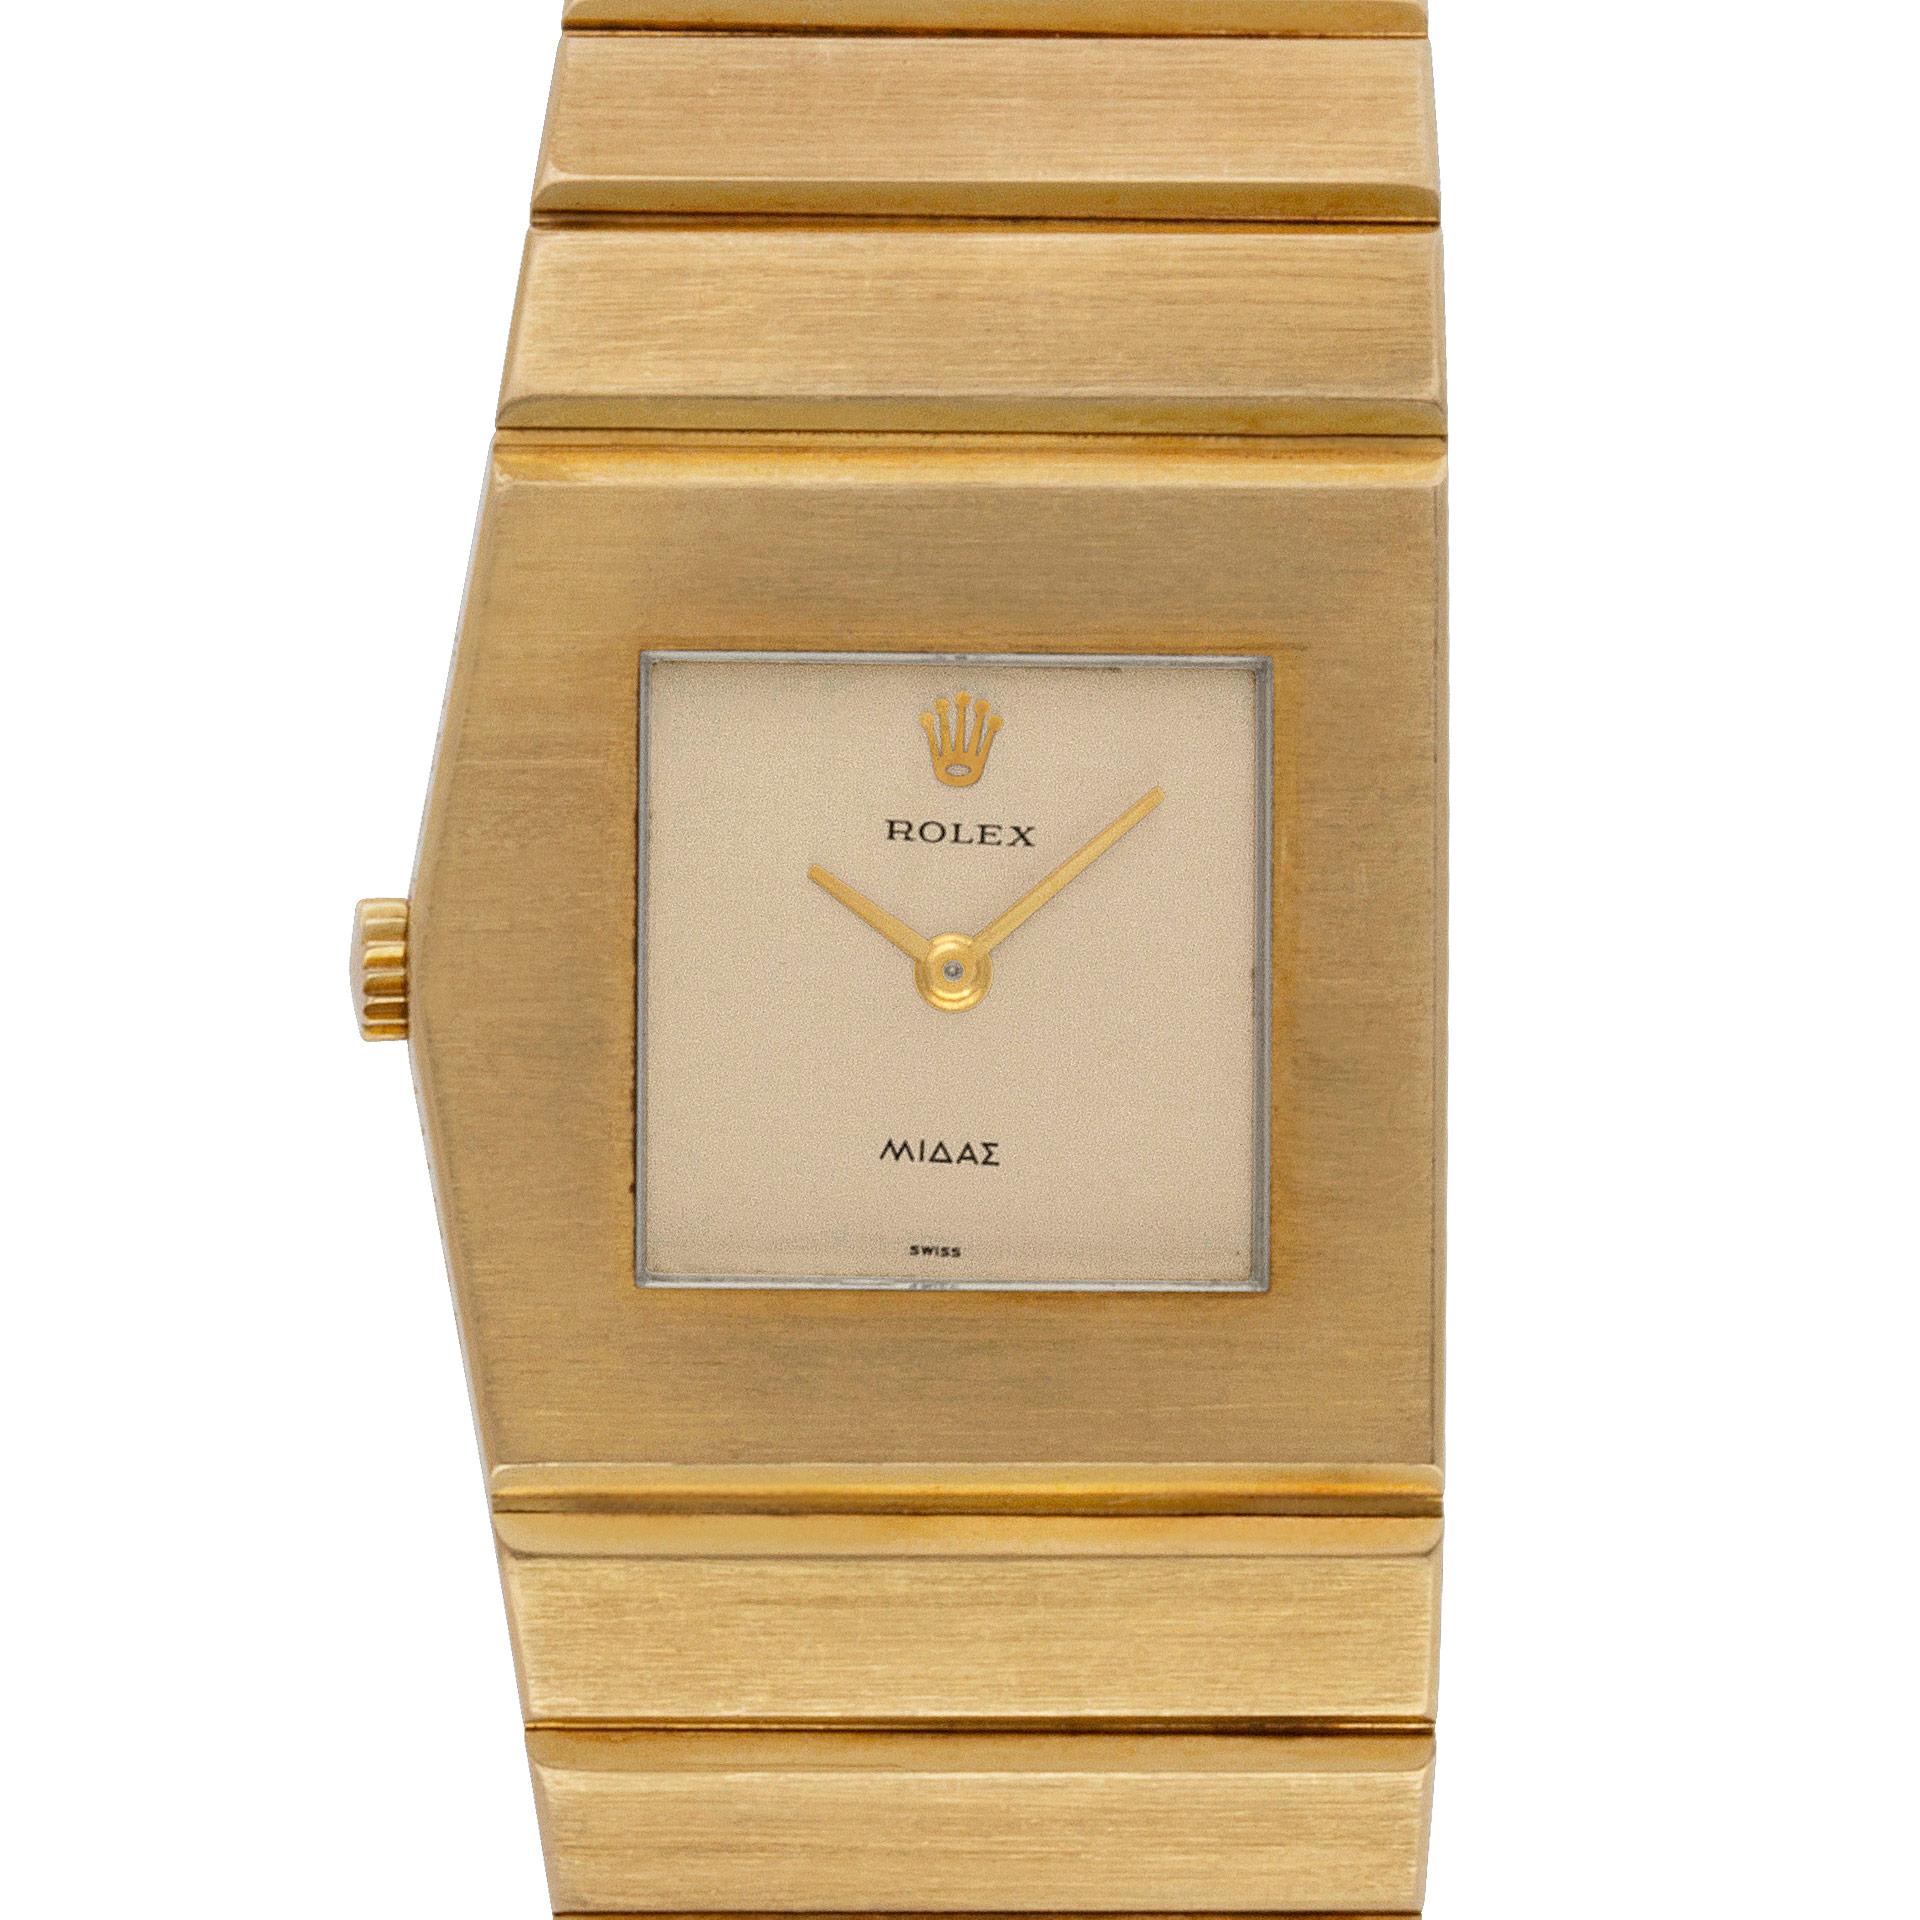 Rolex King Midas 9630 18k Gold dial 27mm Manual watch